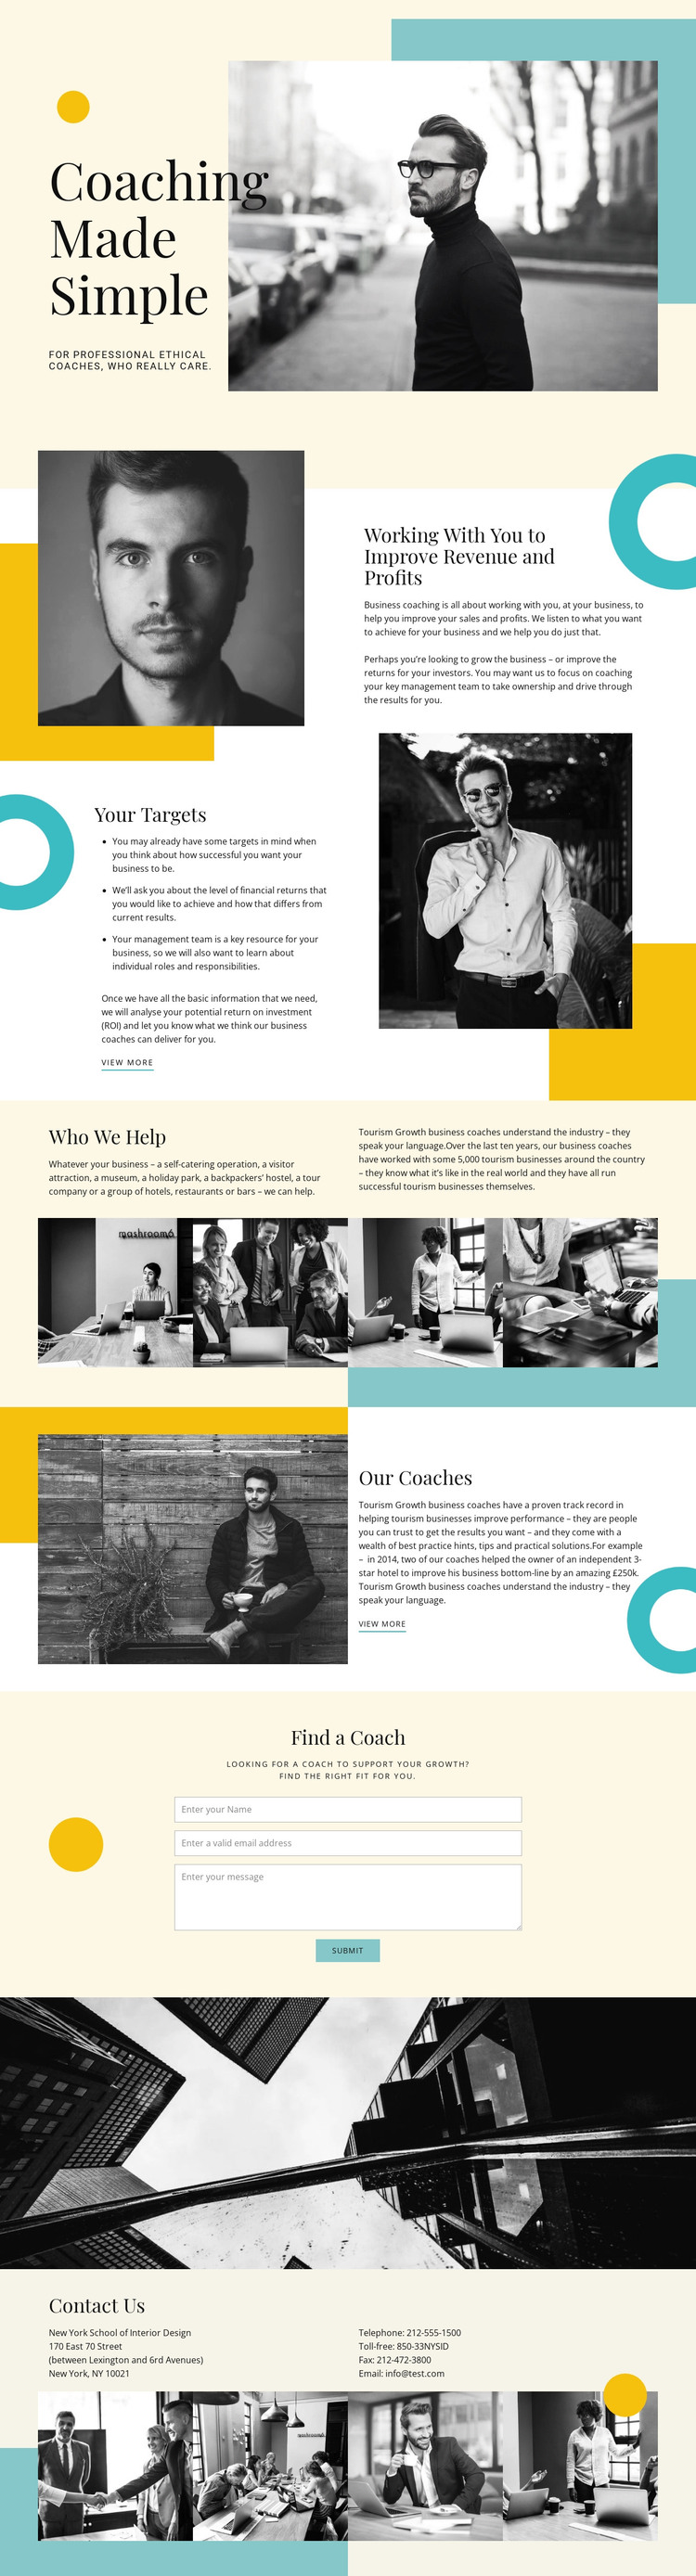 Coaching Company Web Design